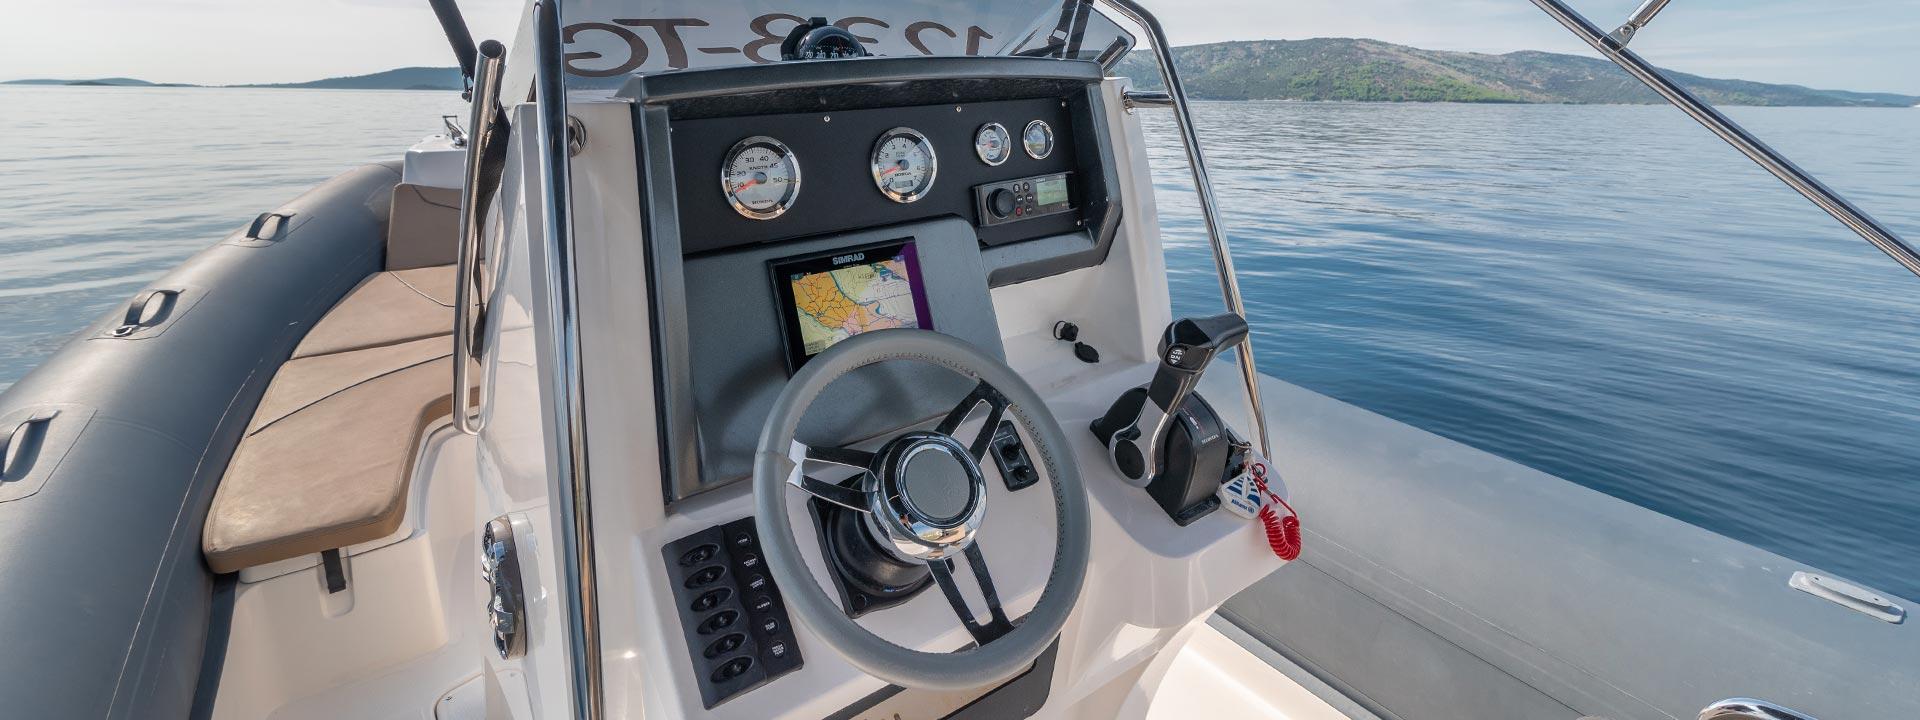 mayer-charter-boat-header-bwa-gto-sport-26-02